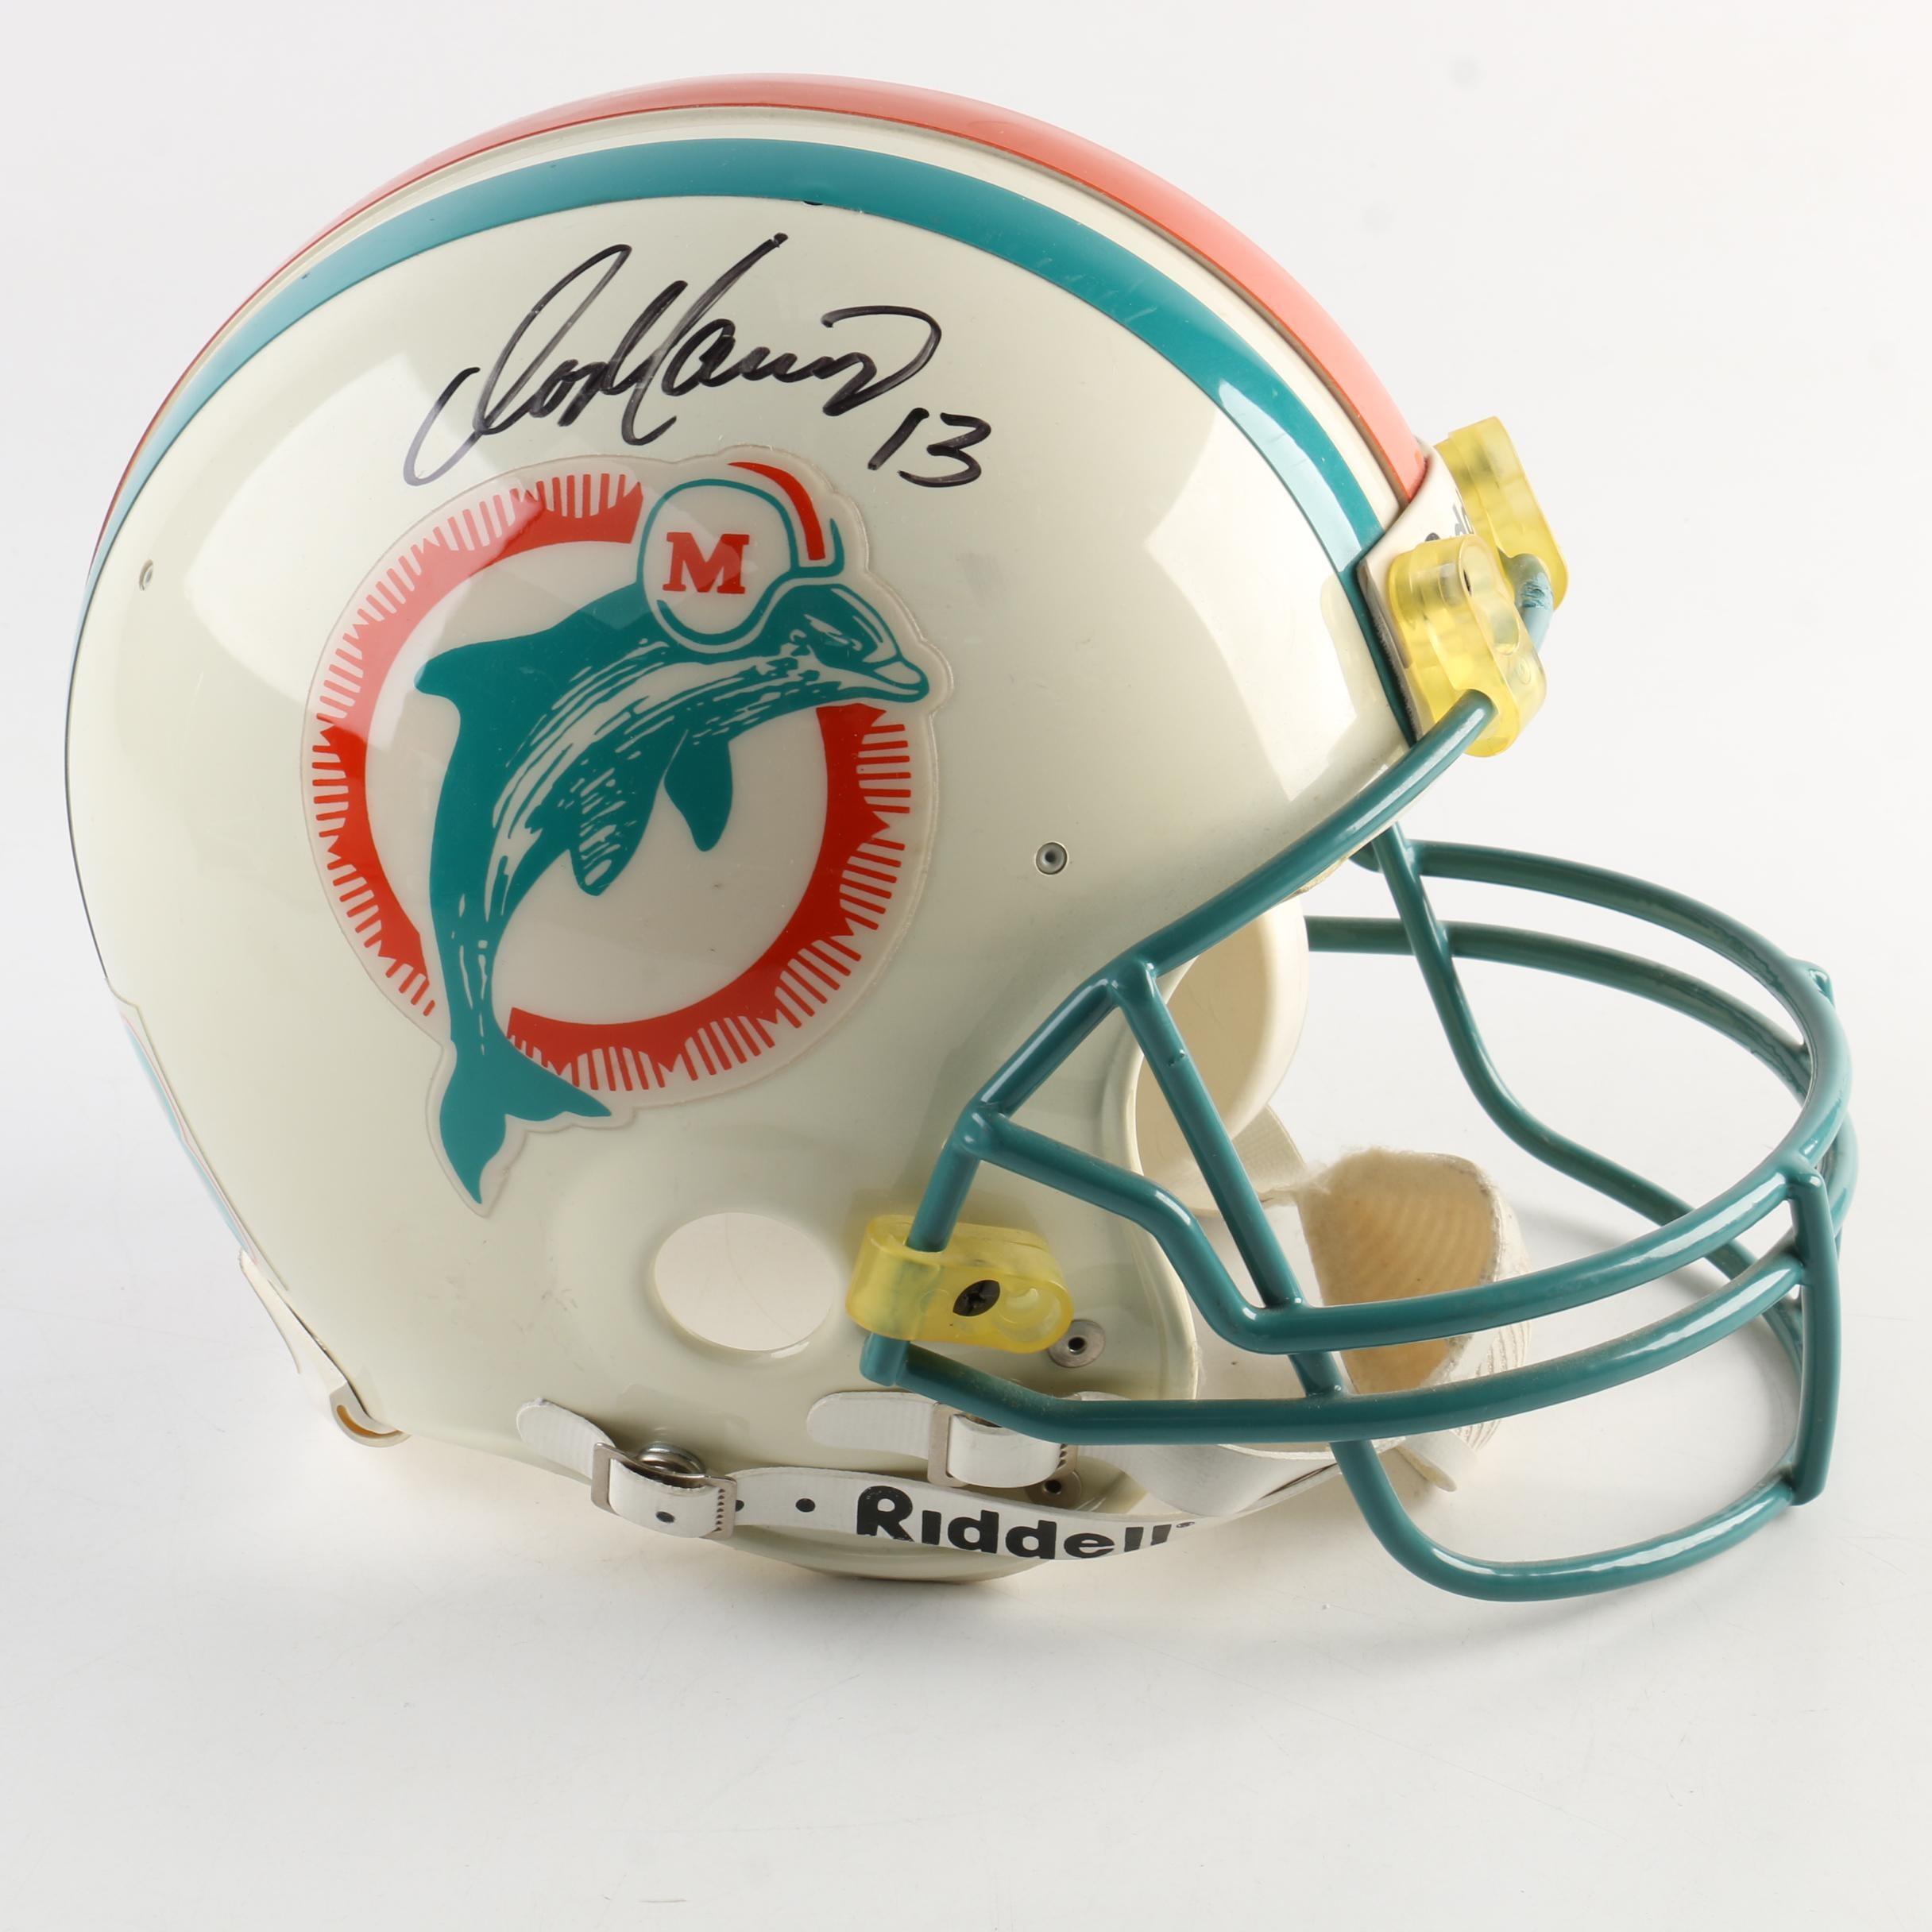 Autographed Dan Marino Miami Dolphins Football Helmet